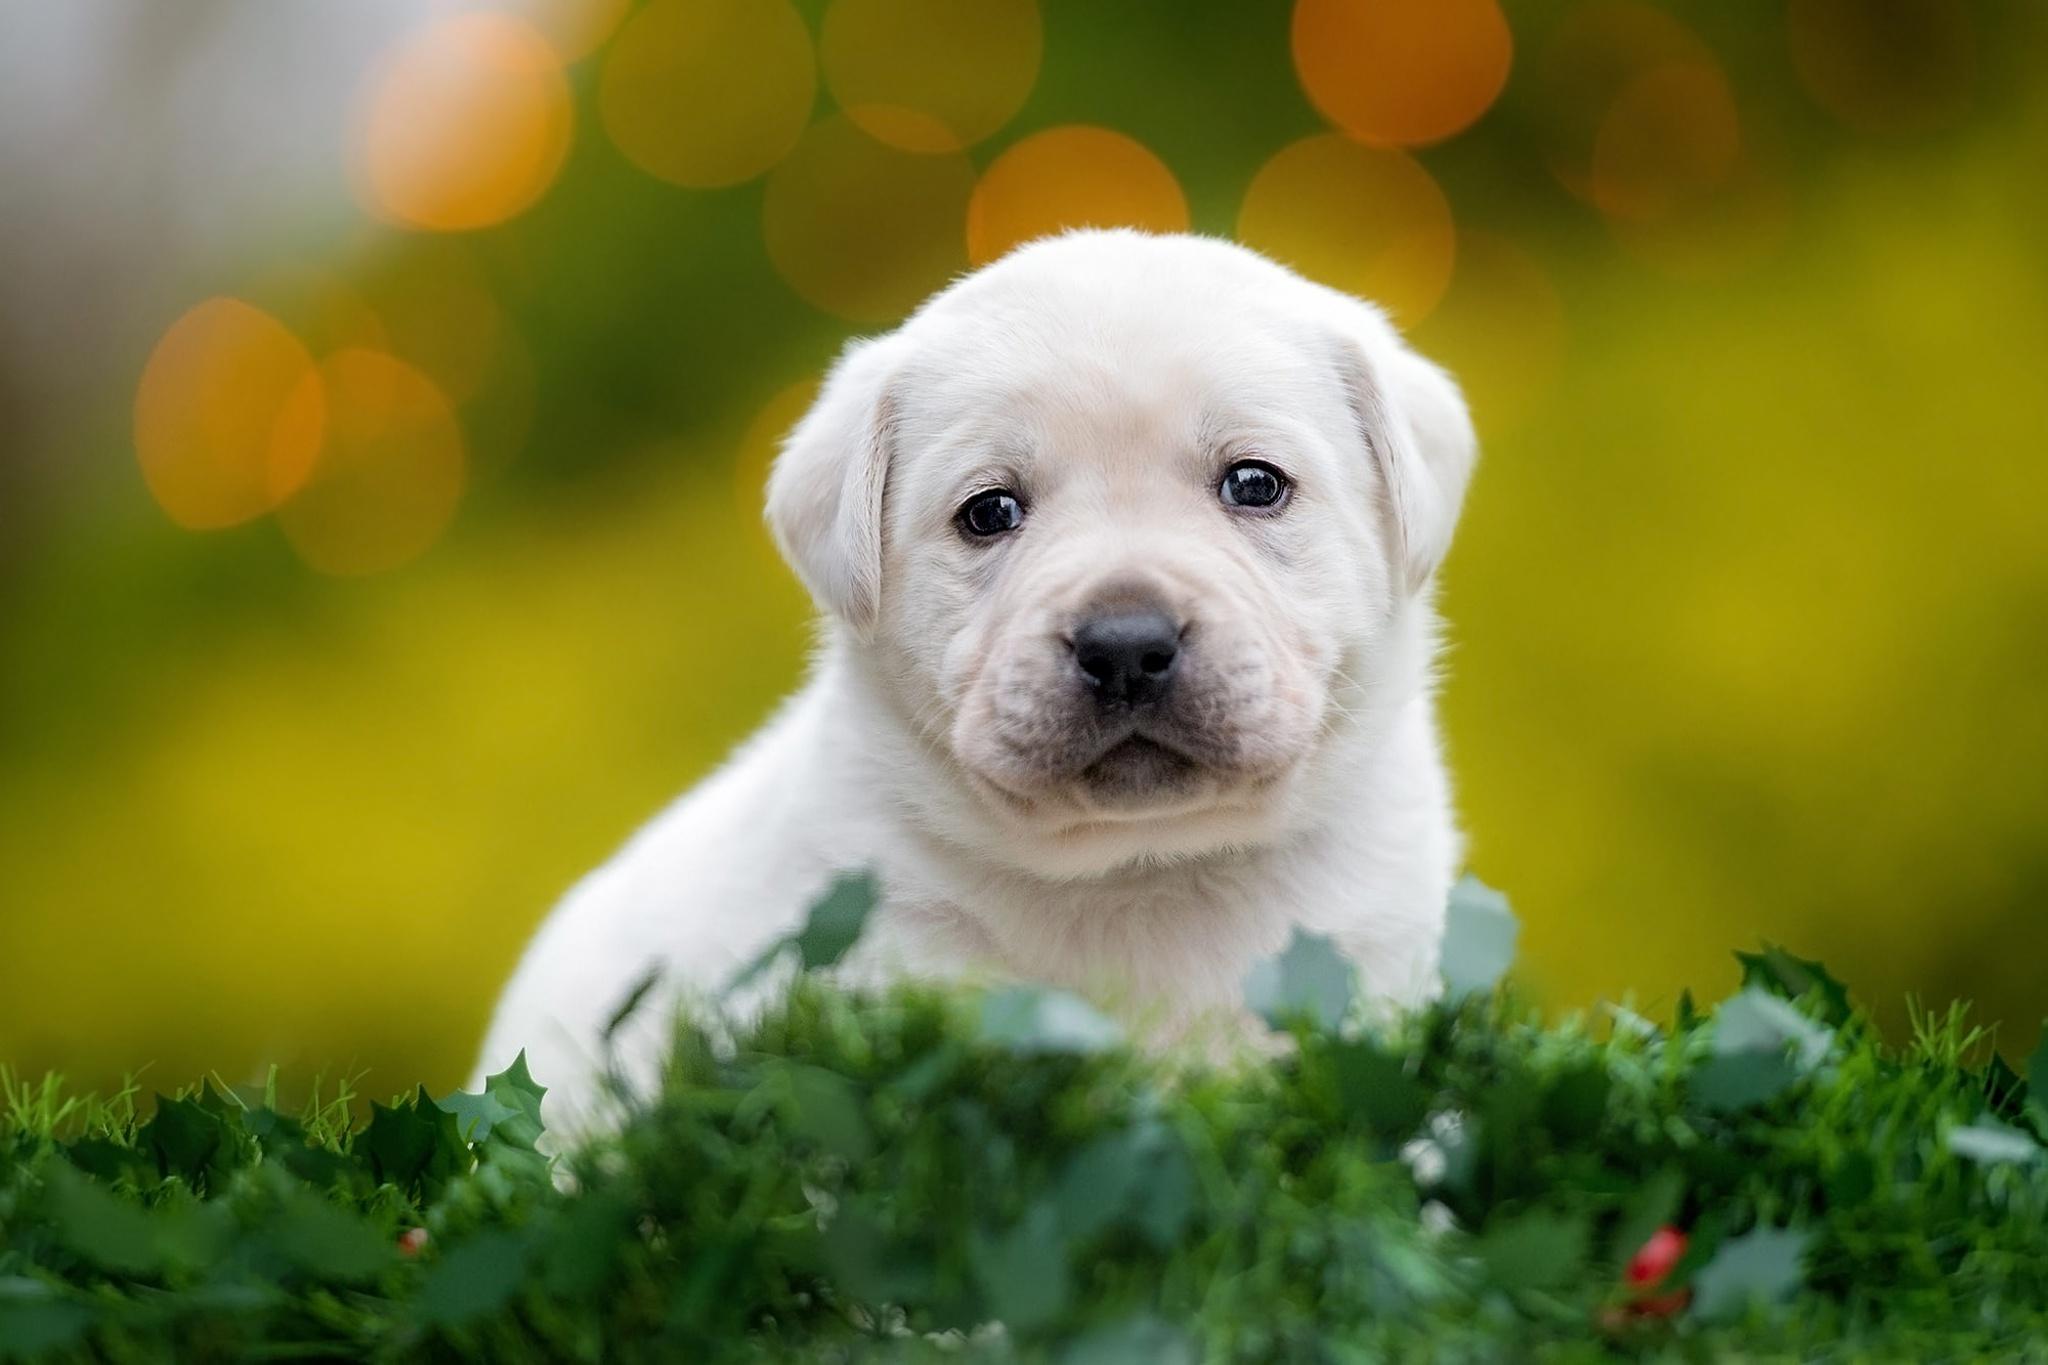 Dog Puppy Pet Baby Animal 2048x1365